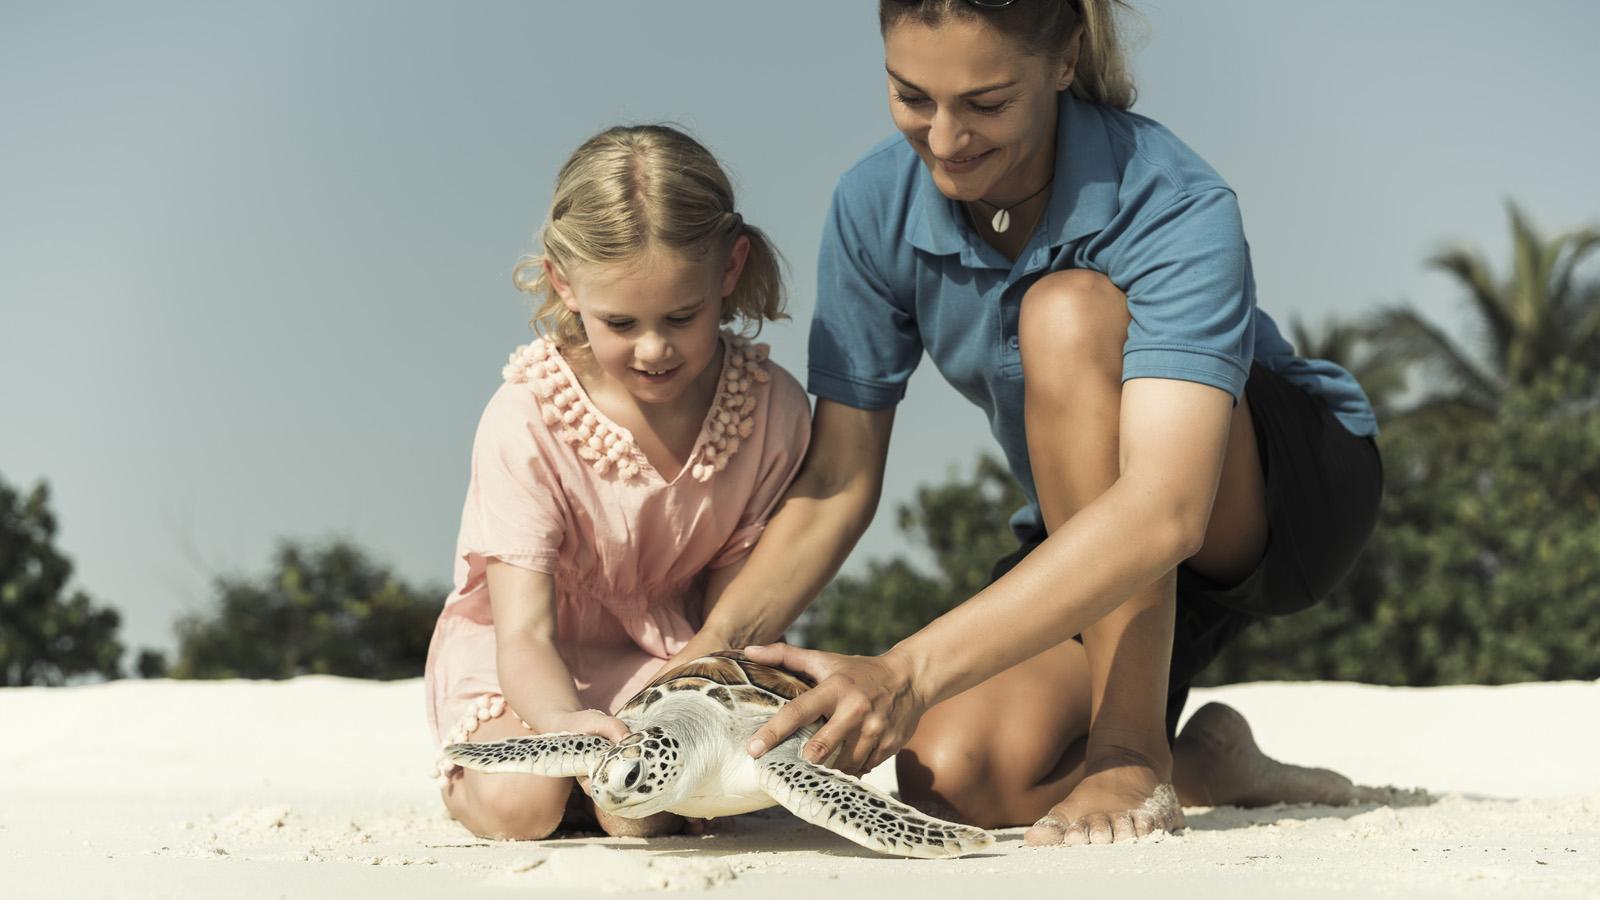 Four Seasons sustainability turtles [MAL_1008]